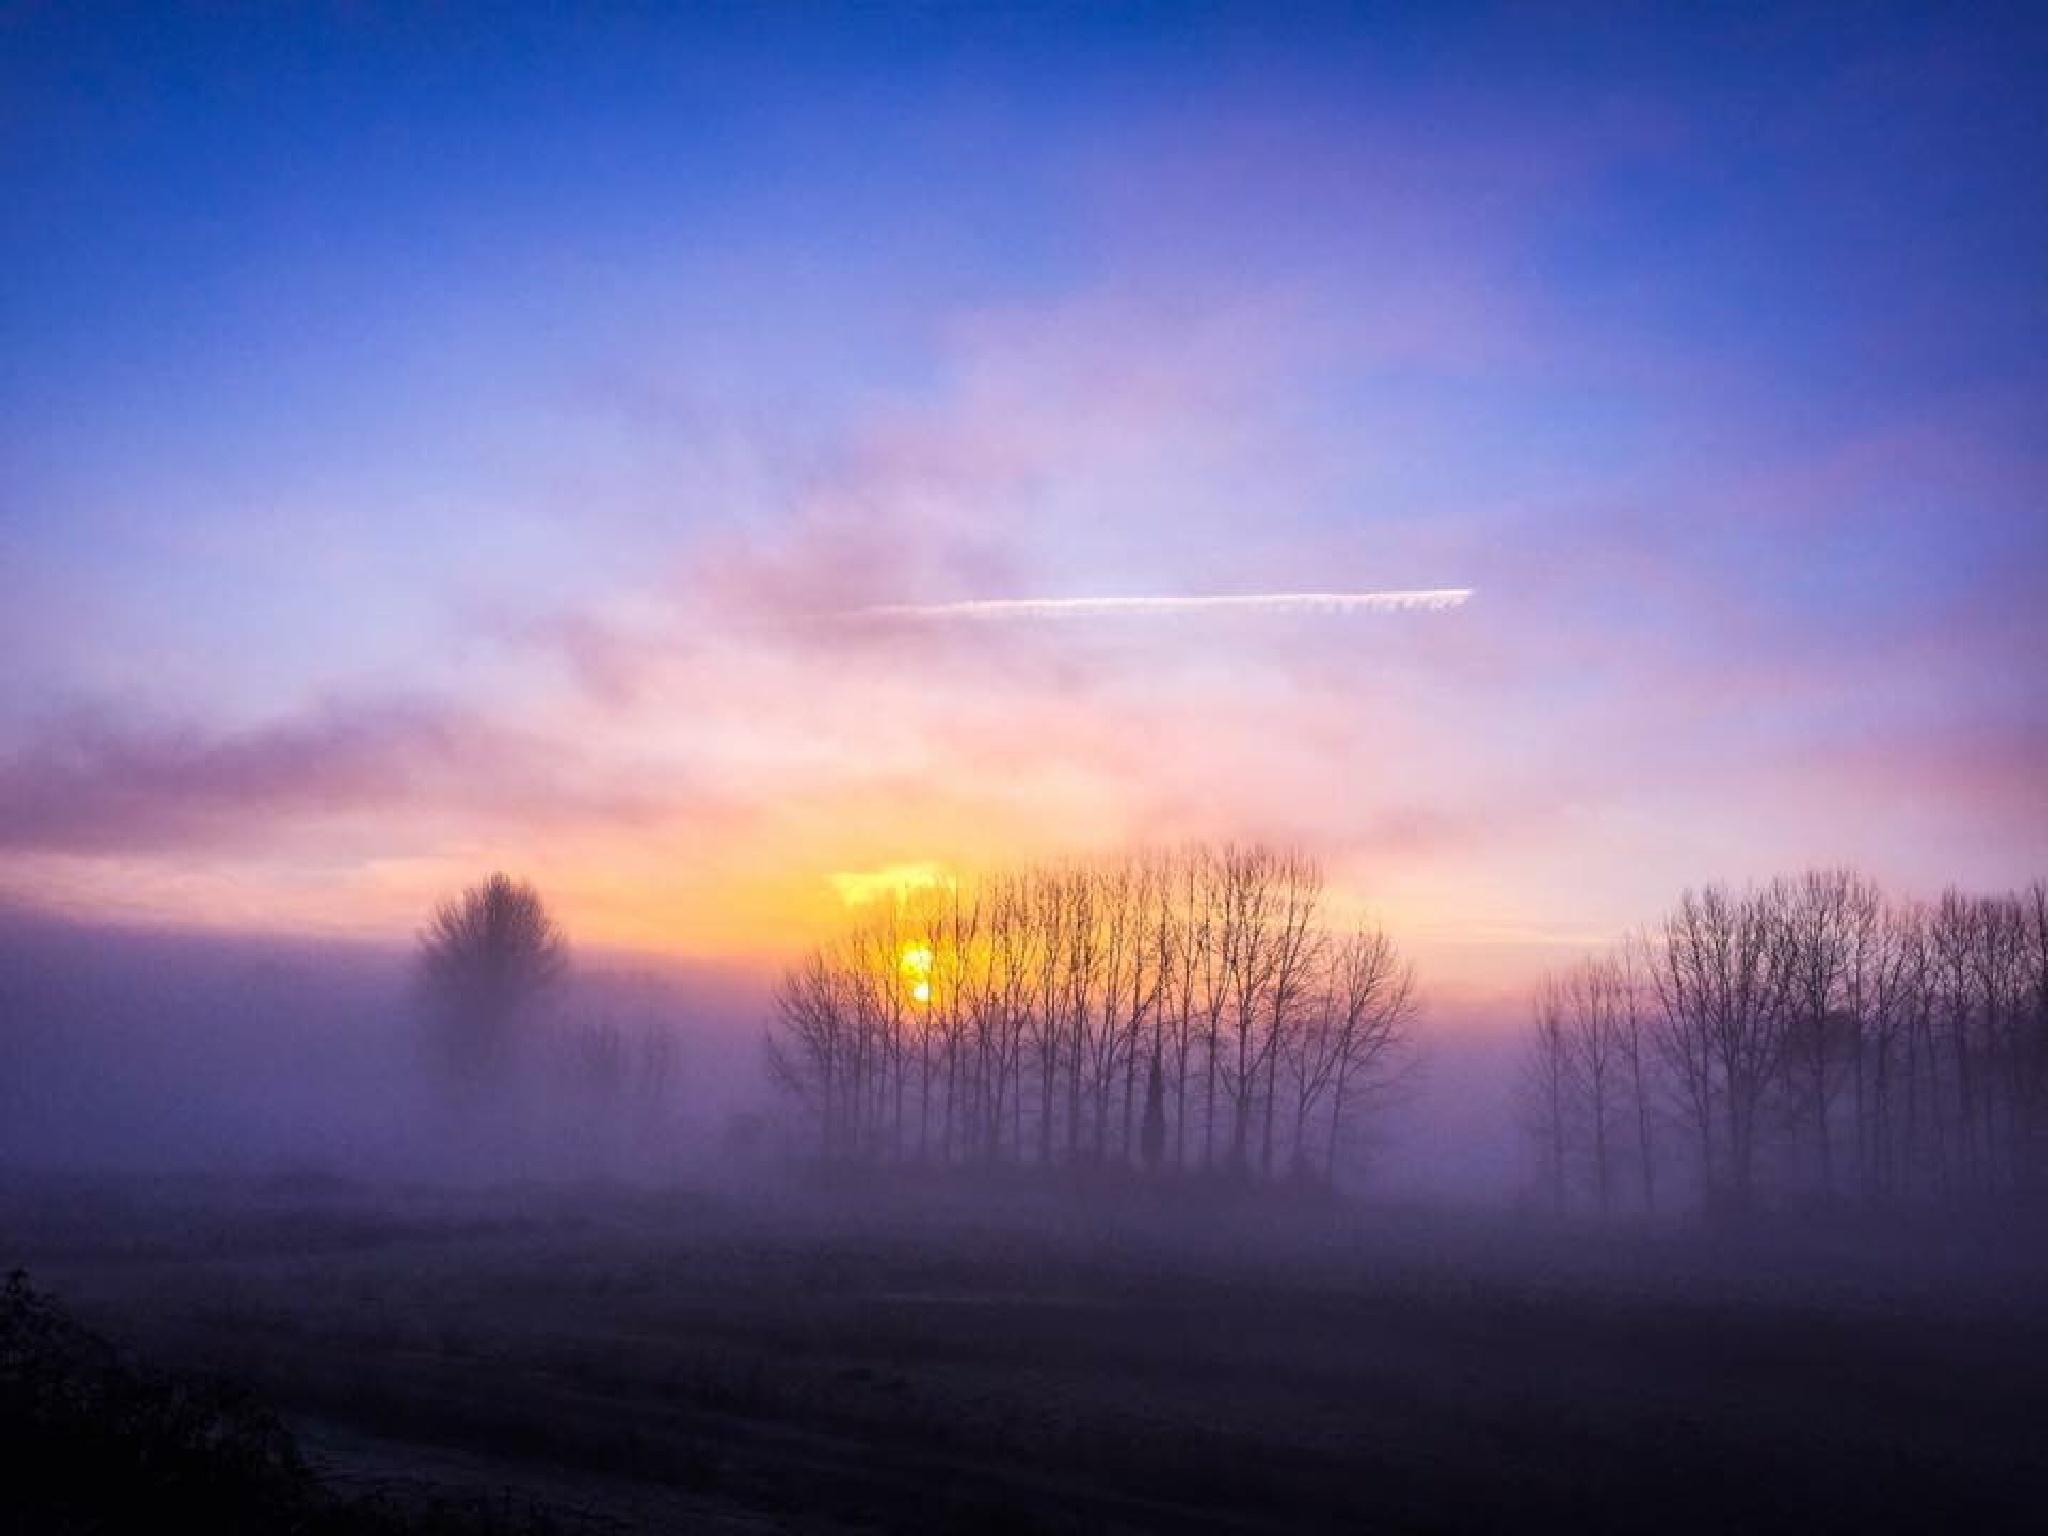 Foggy morning by peyton0104